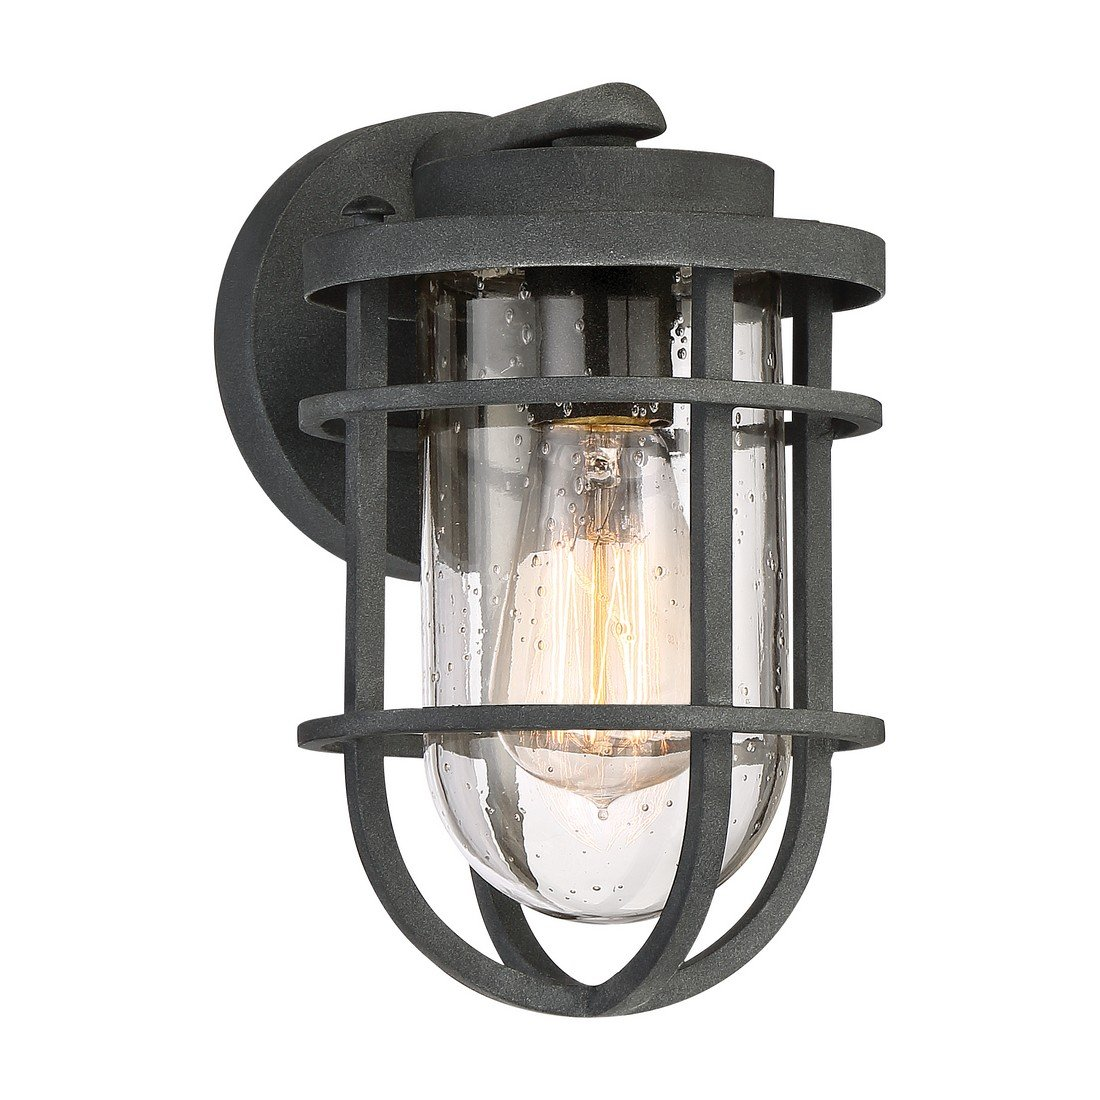 Quoizel One Light Outdoor Wall Lantern BRD8406MB, Small, Mottled Black